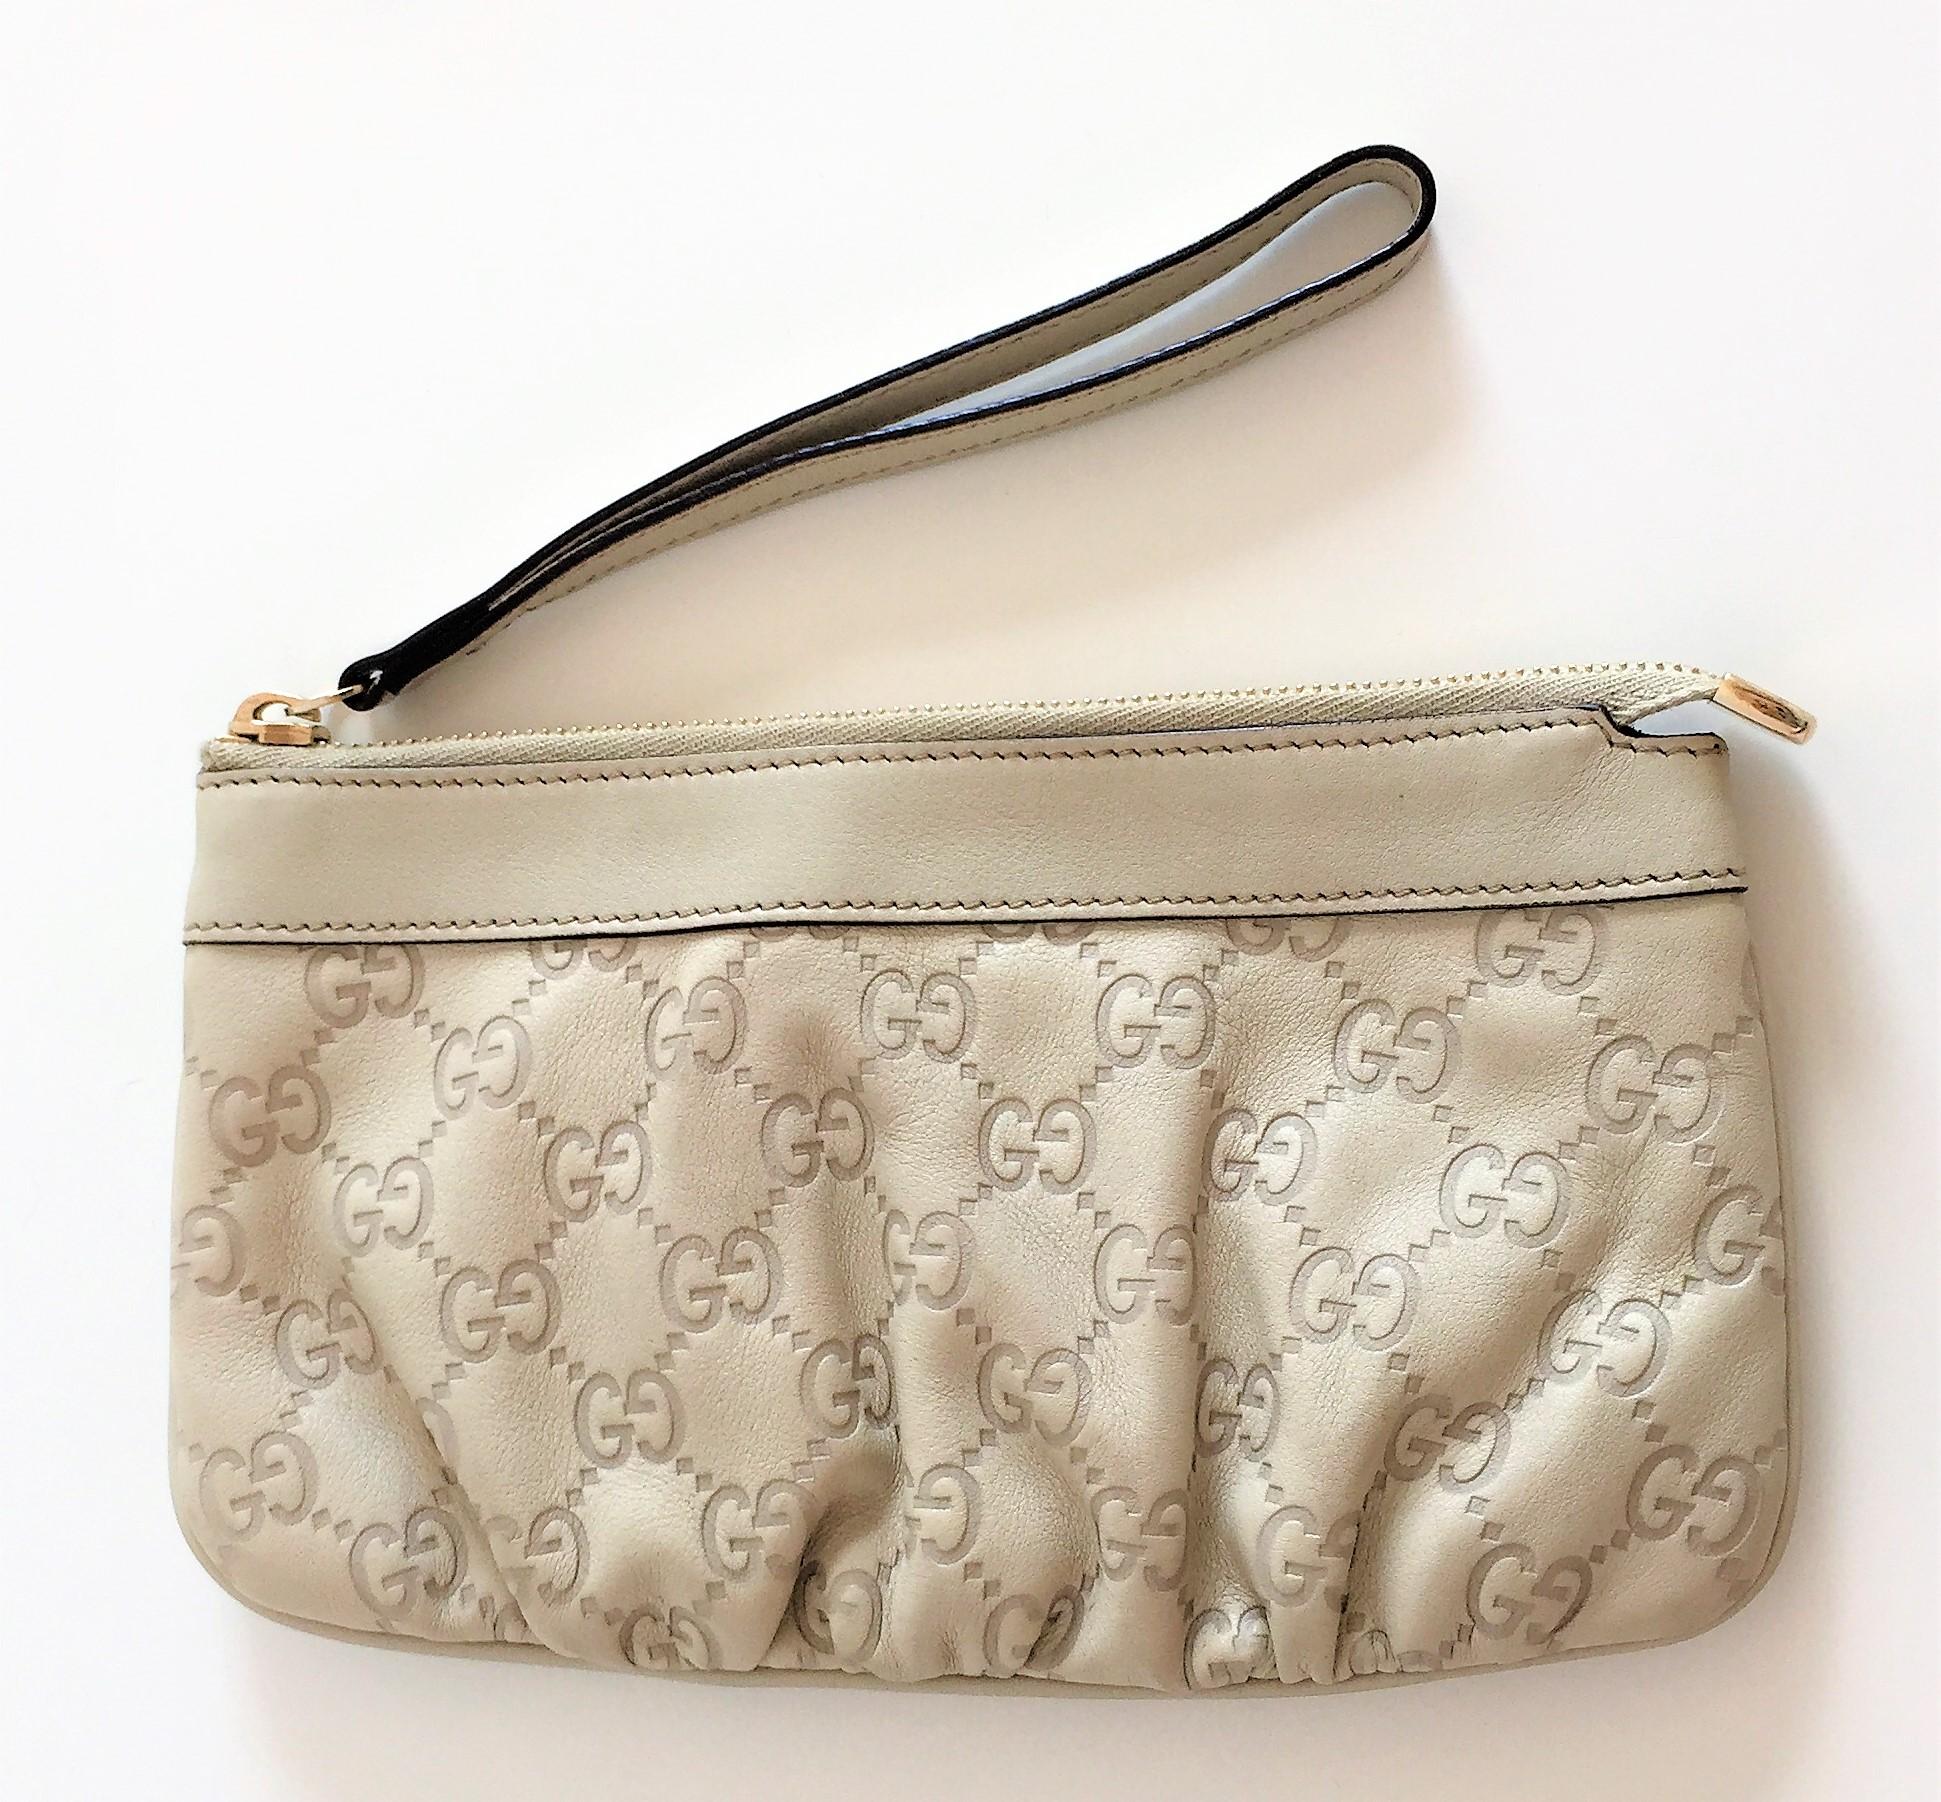 Gucci Clutch In Excellent Condition Ivory Leather Guccissima Alma Mini Bag